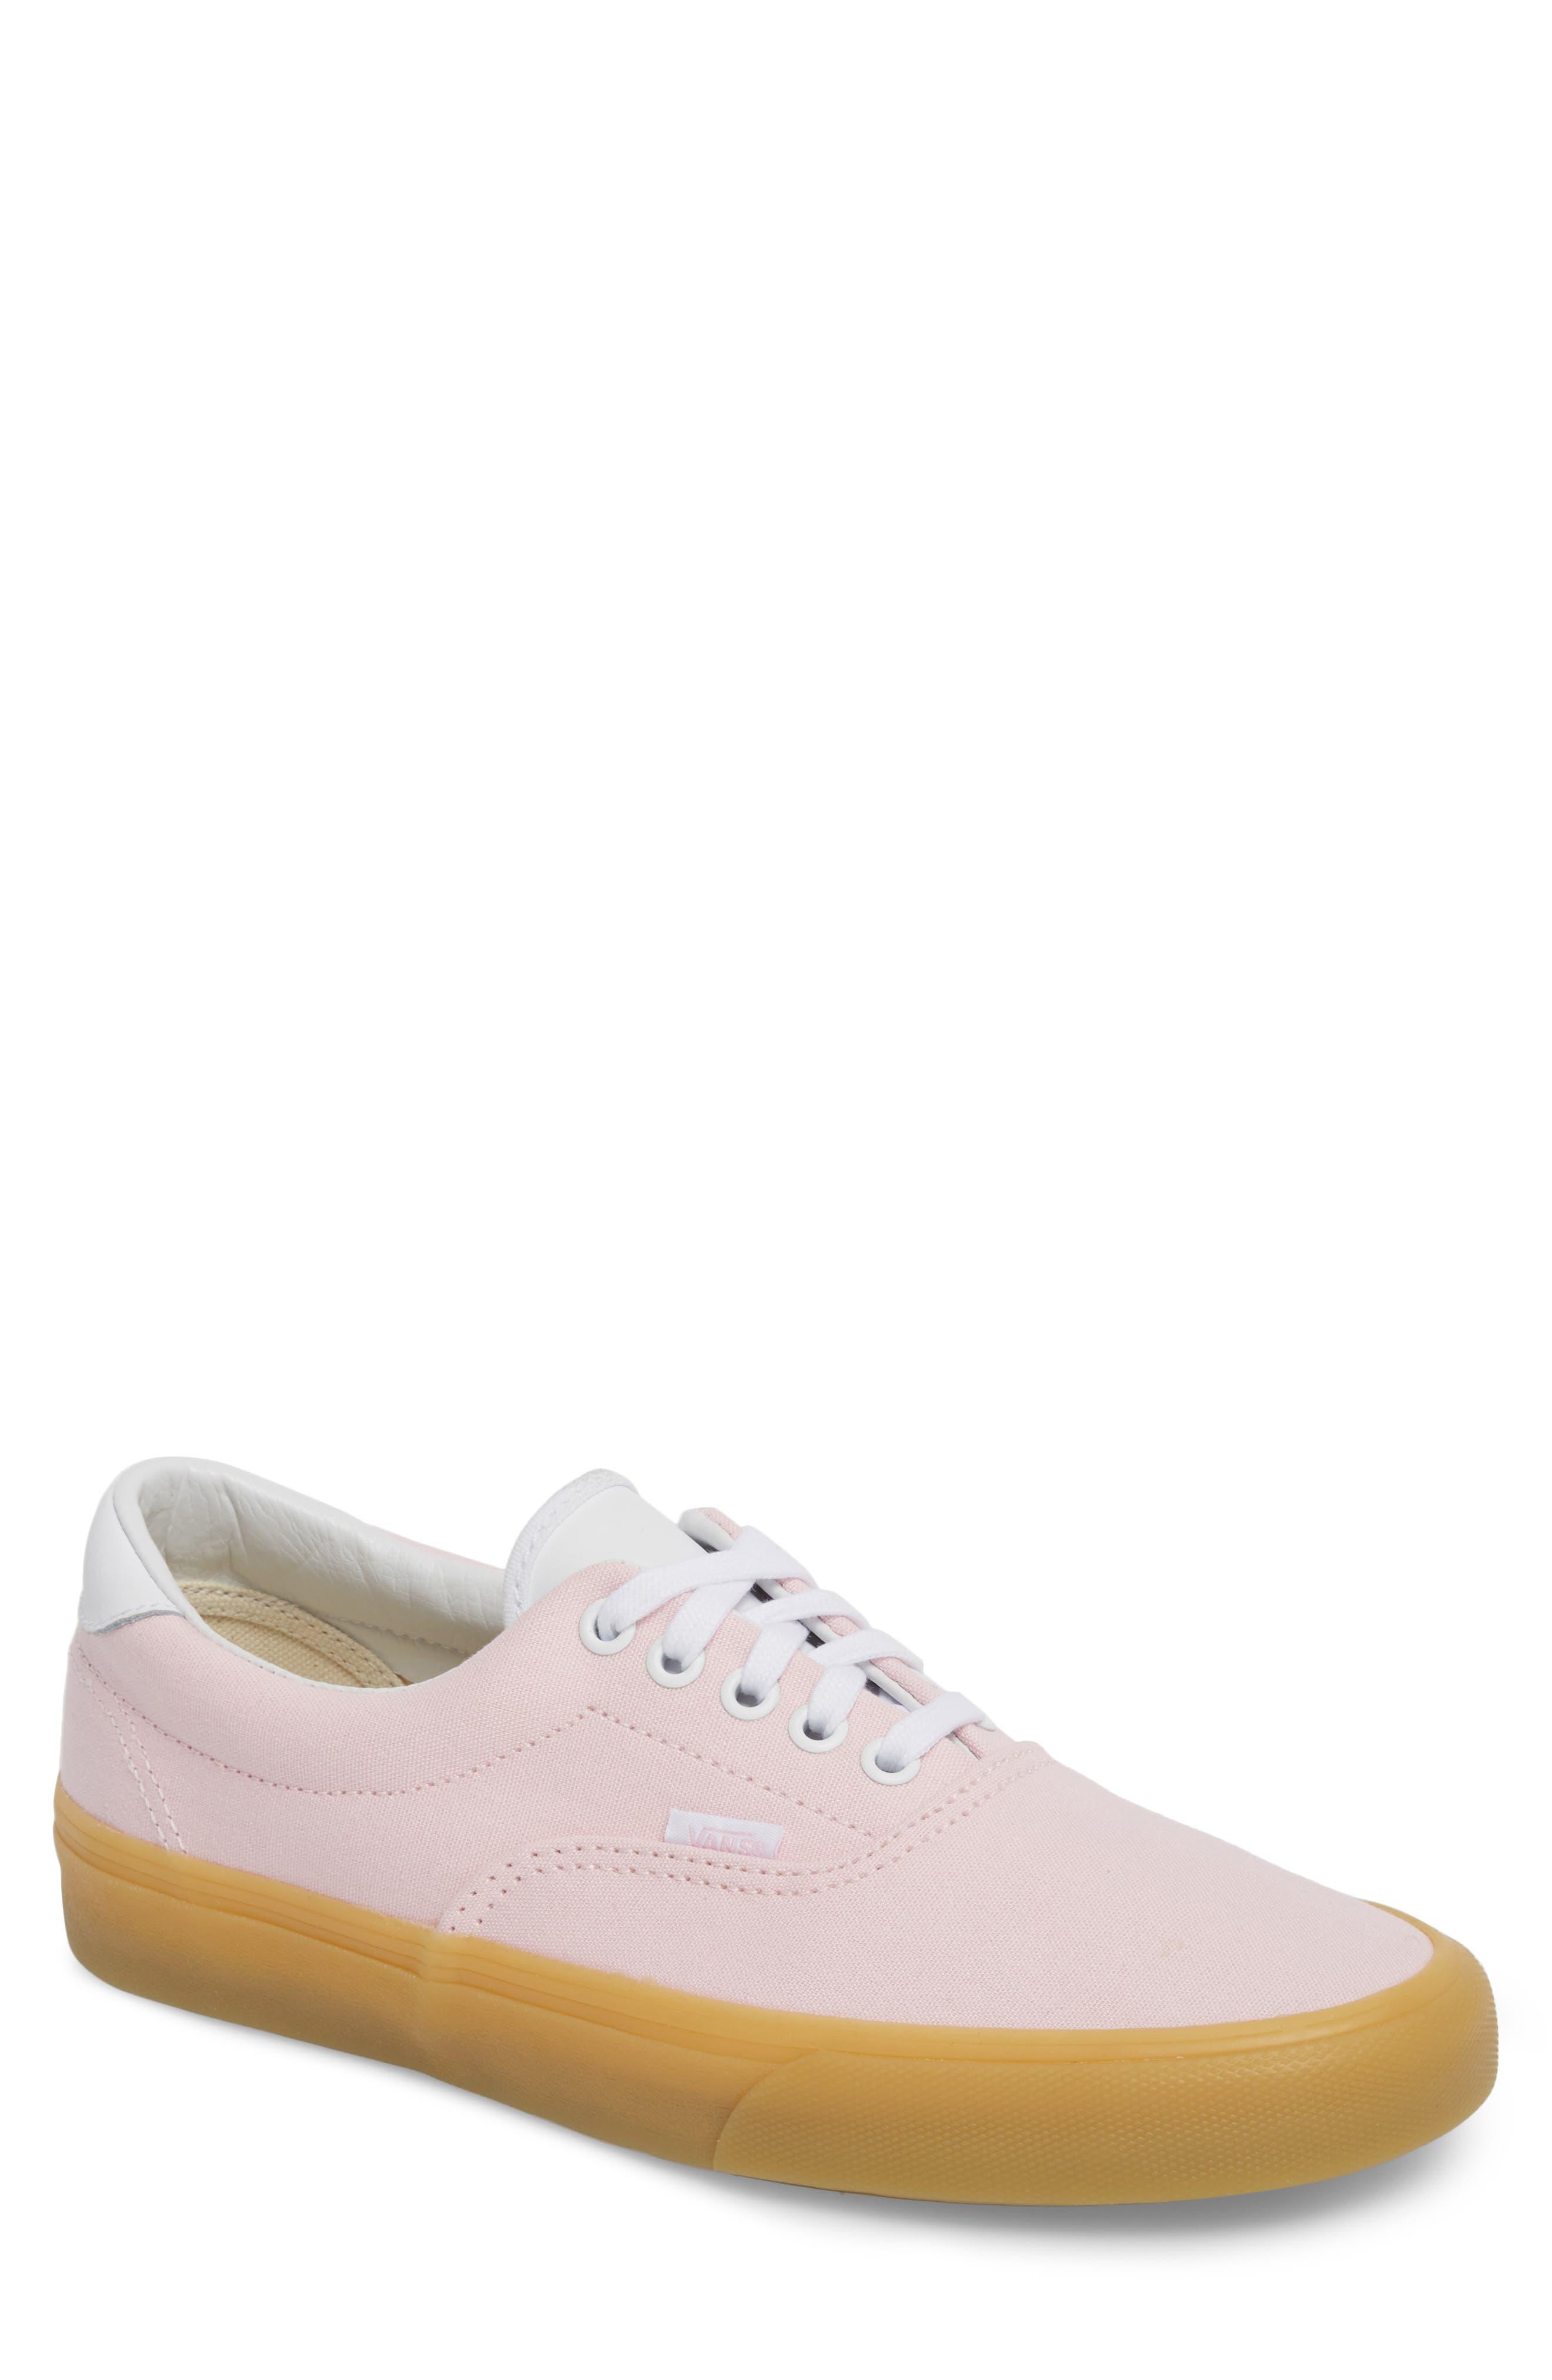 Era 59 Gum Sneaker,                         Main,                         color, Chalk Pink